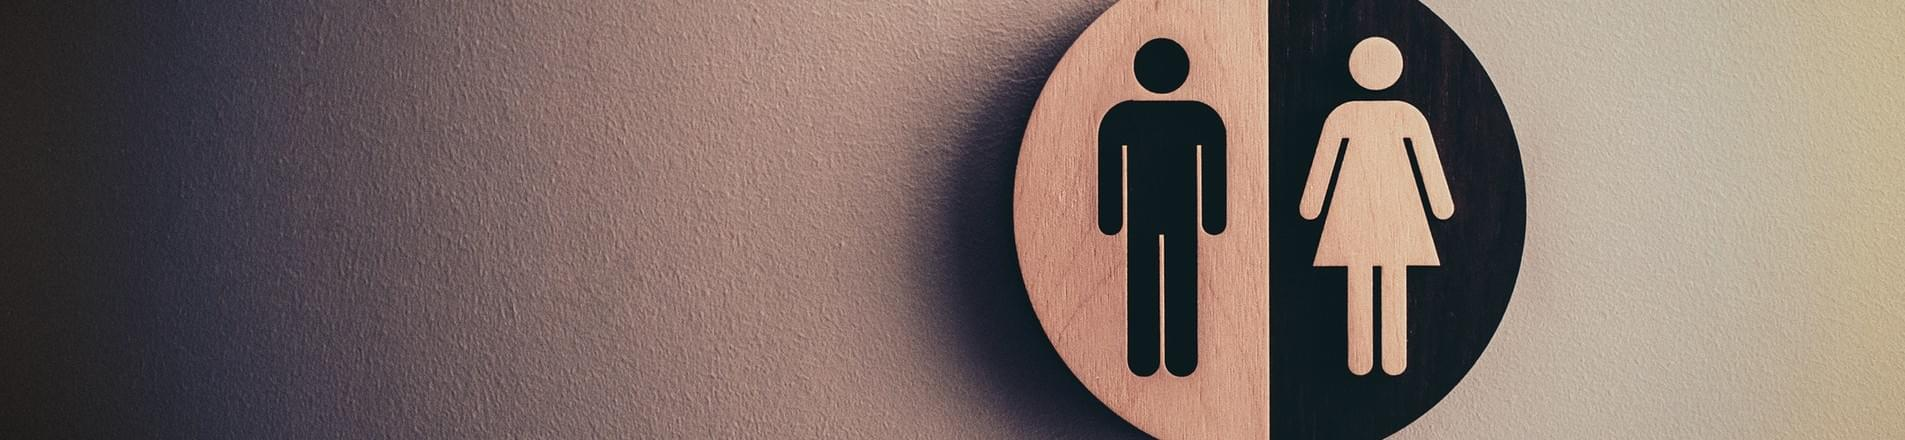 Gender Gap makes headlines across Continents